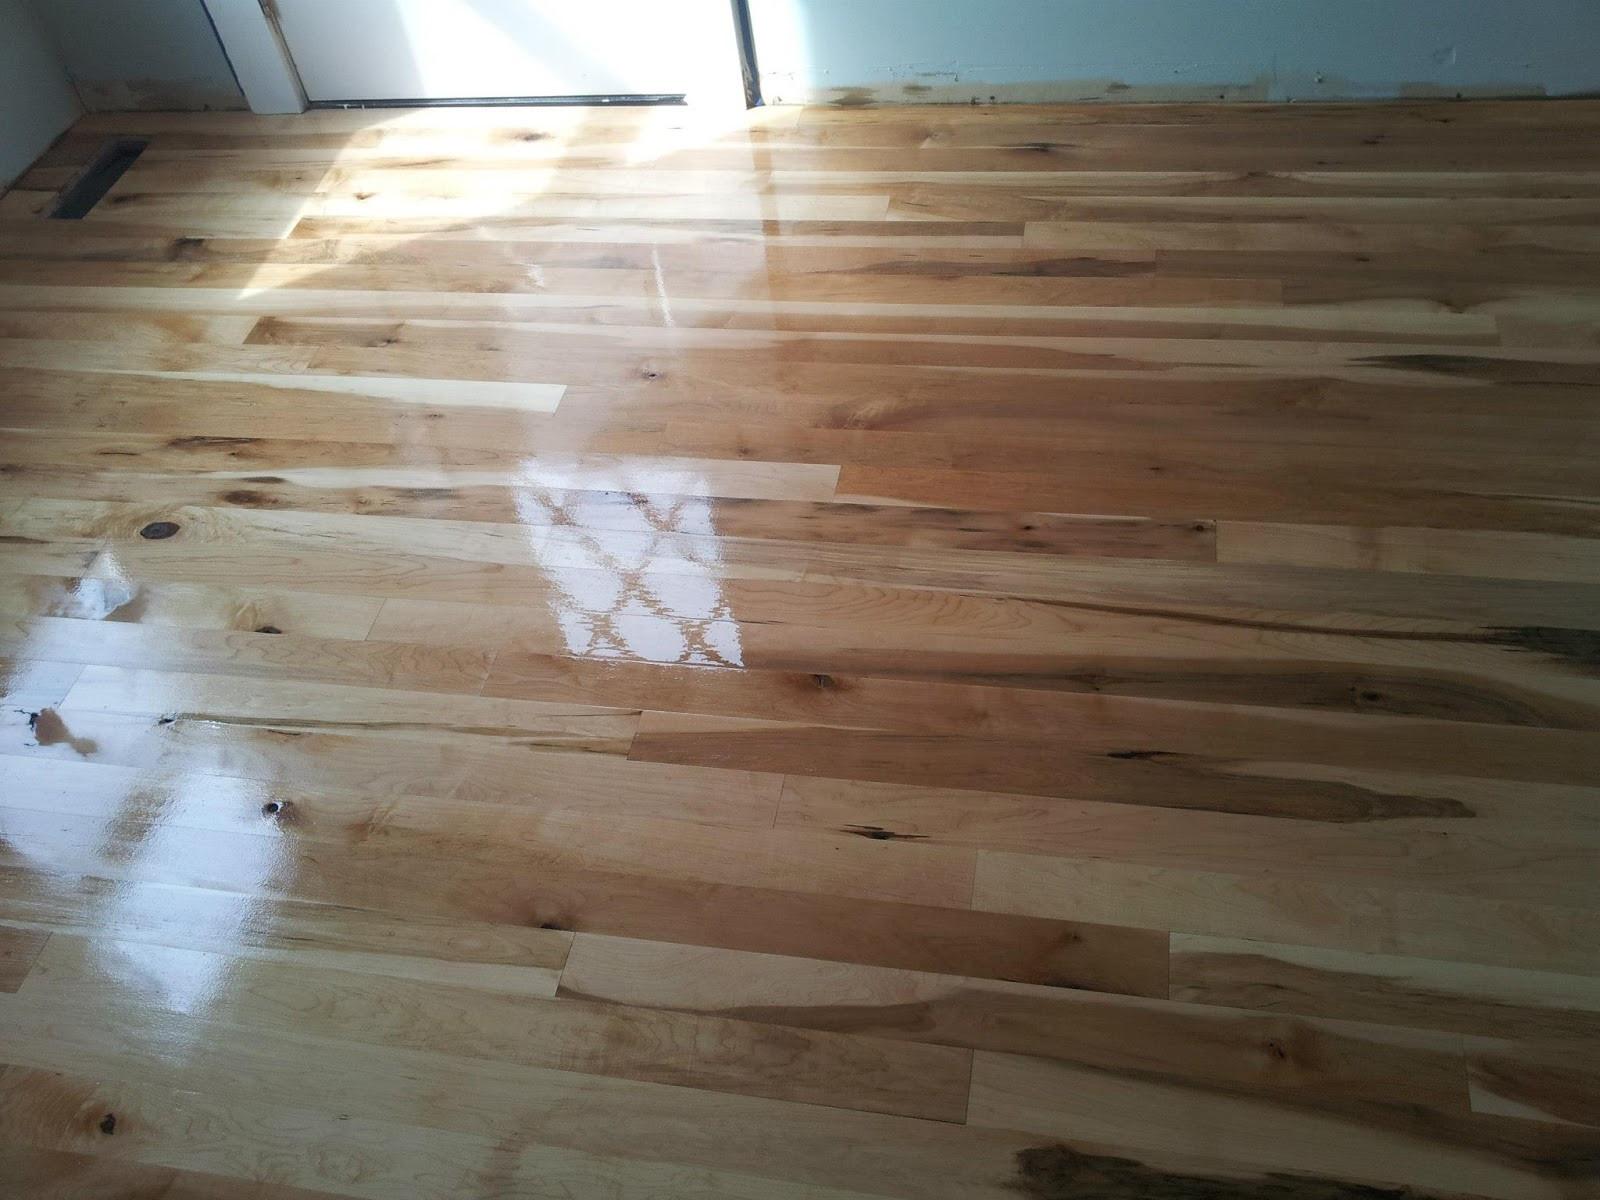 hardwood floor refinishing companies near me of floor refinishing company hardwood floors service by cris floor with hardwood floor refinishing resurfacing floor refinishing company carolis flooring